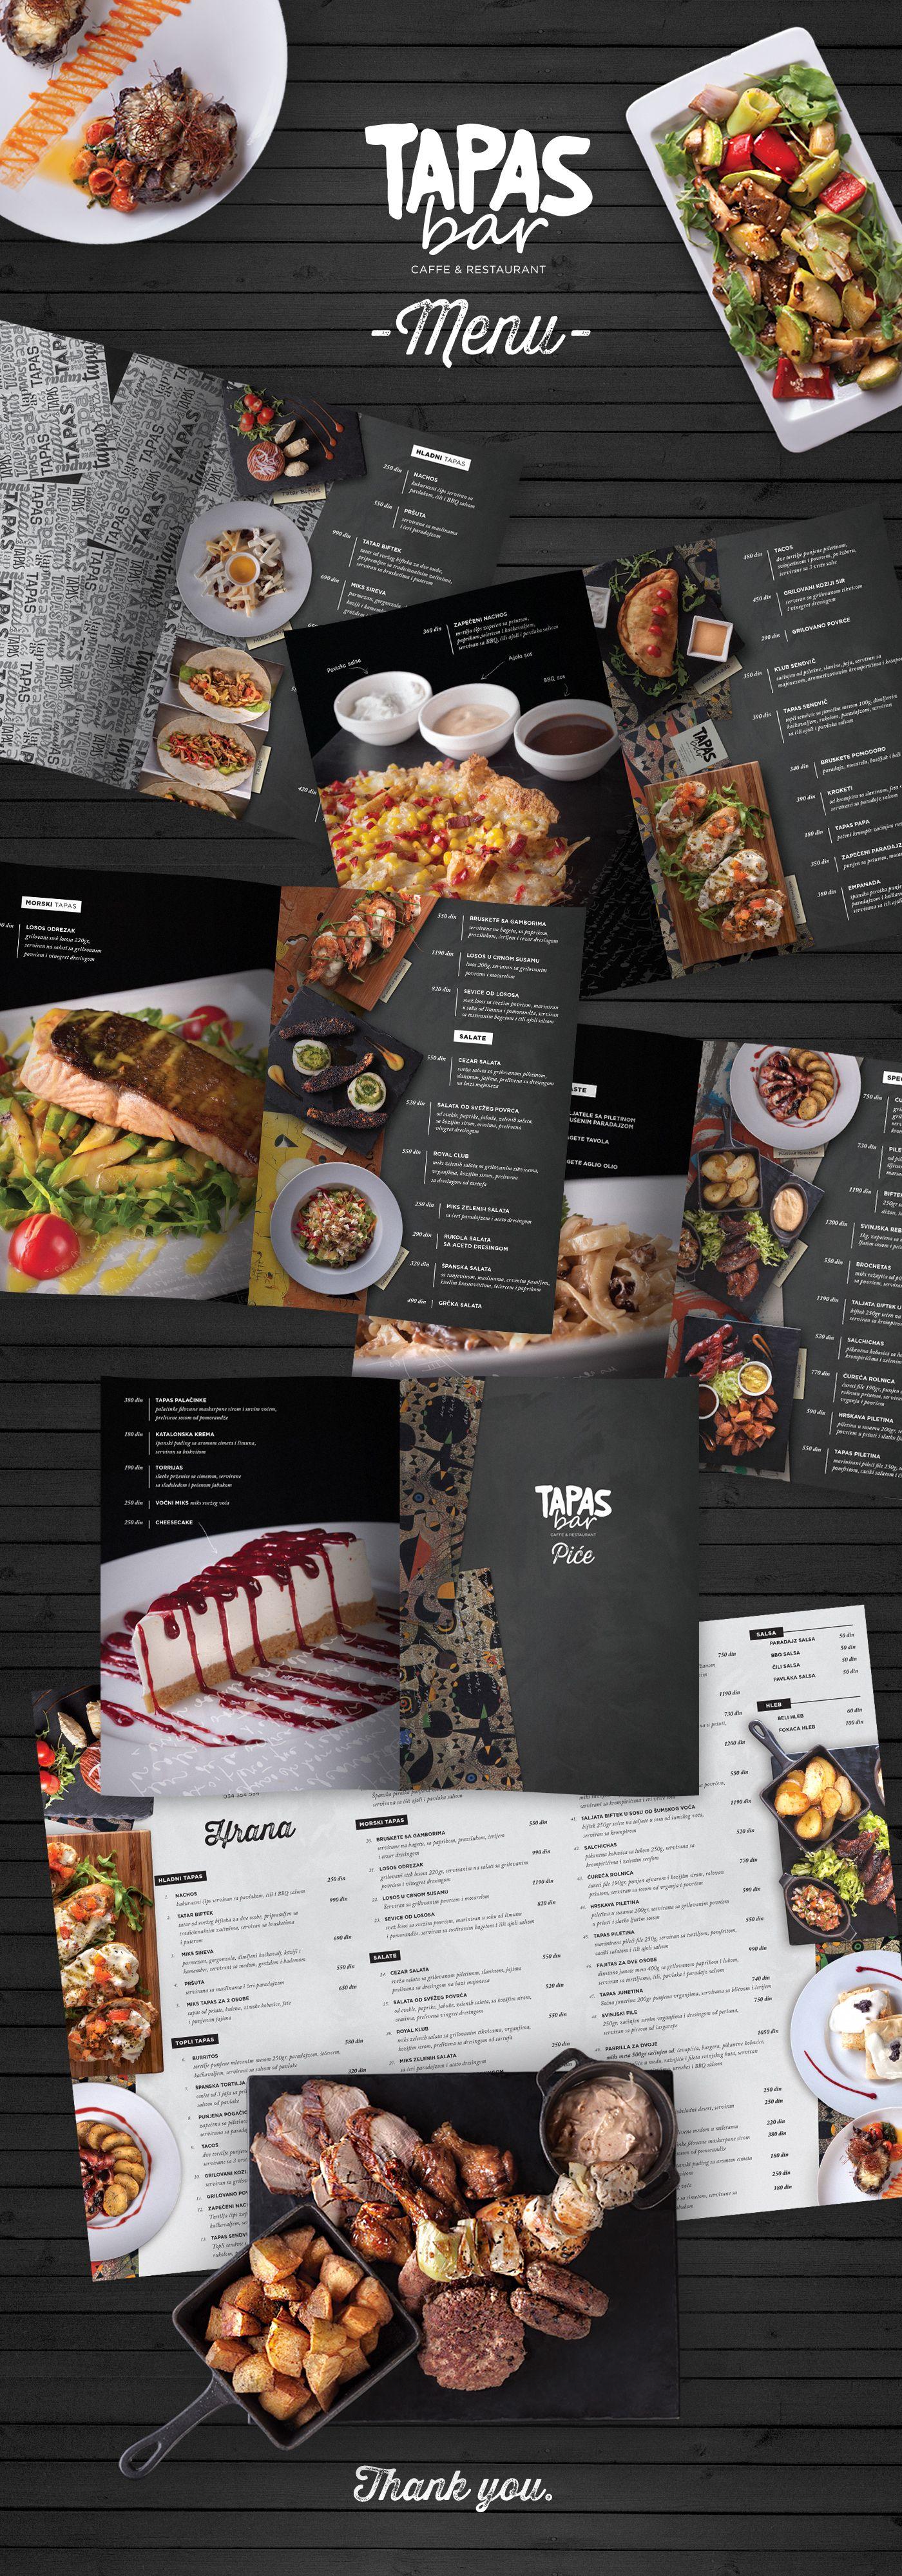 Menu Design For Tapas Bar Restaurantdesign Borko Nericphotography